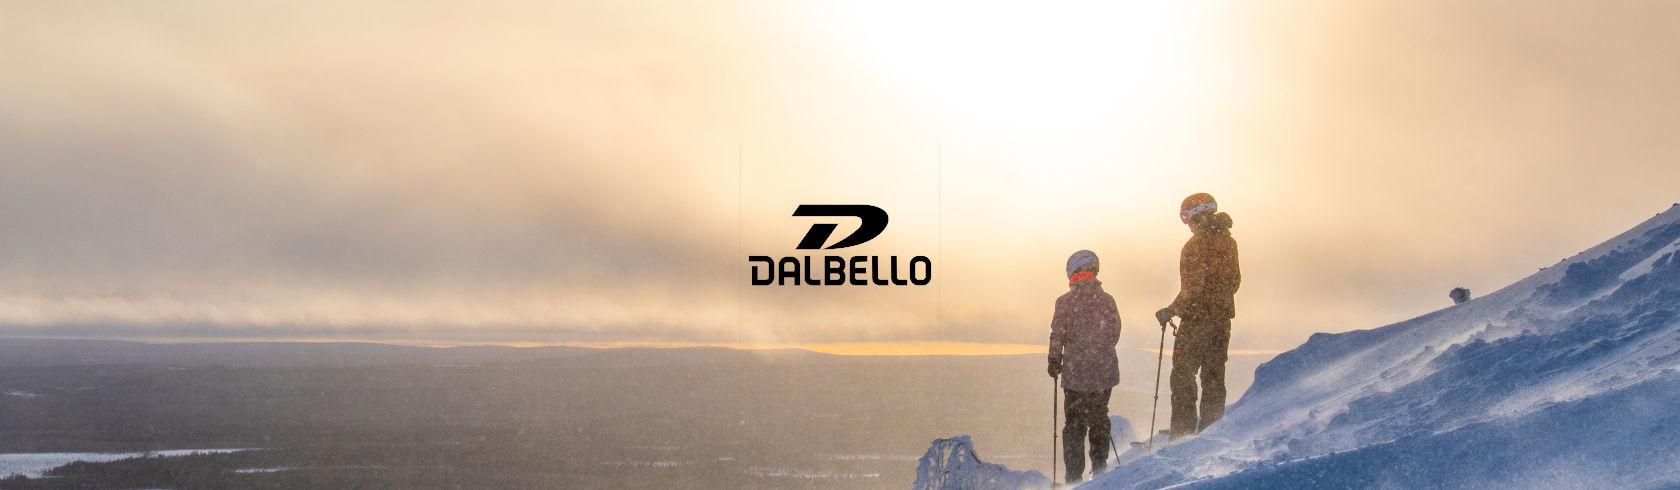 Dalbello brand logo